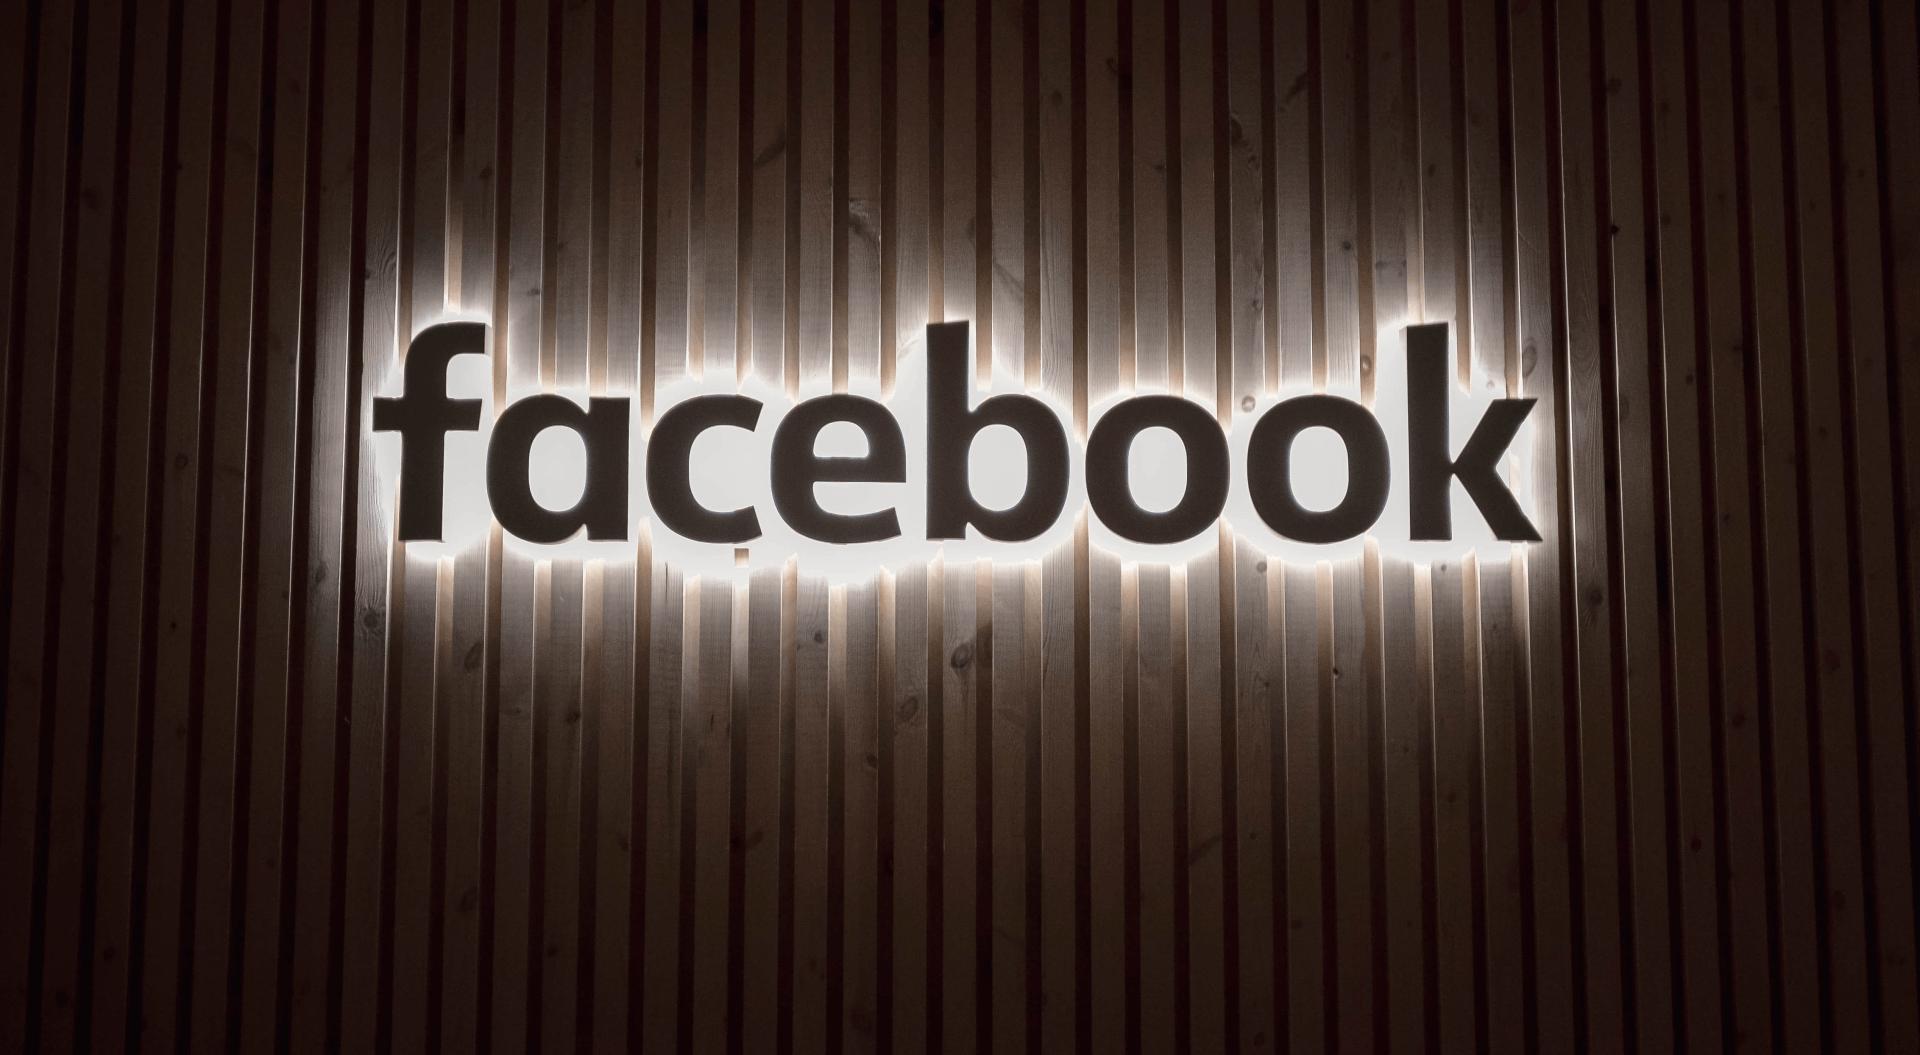 Facebookkasten